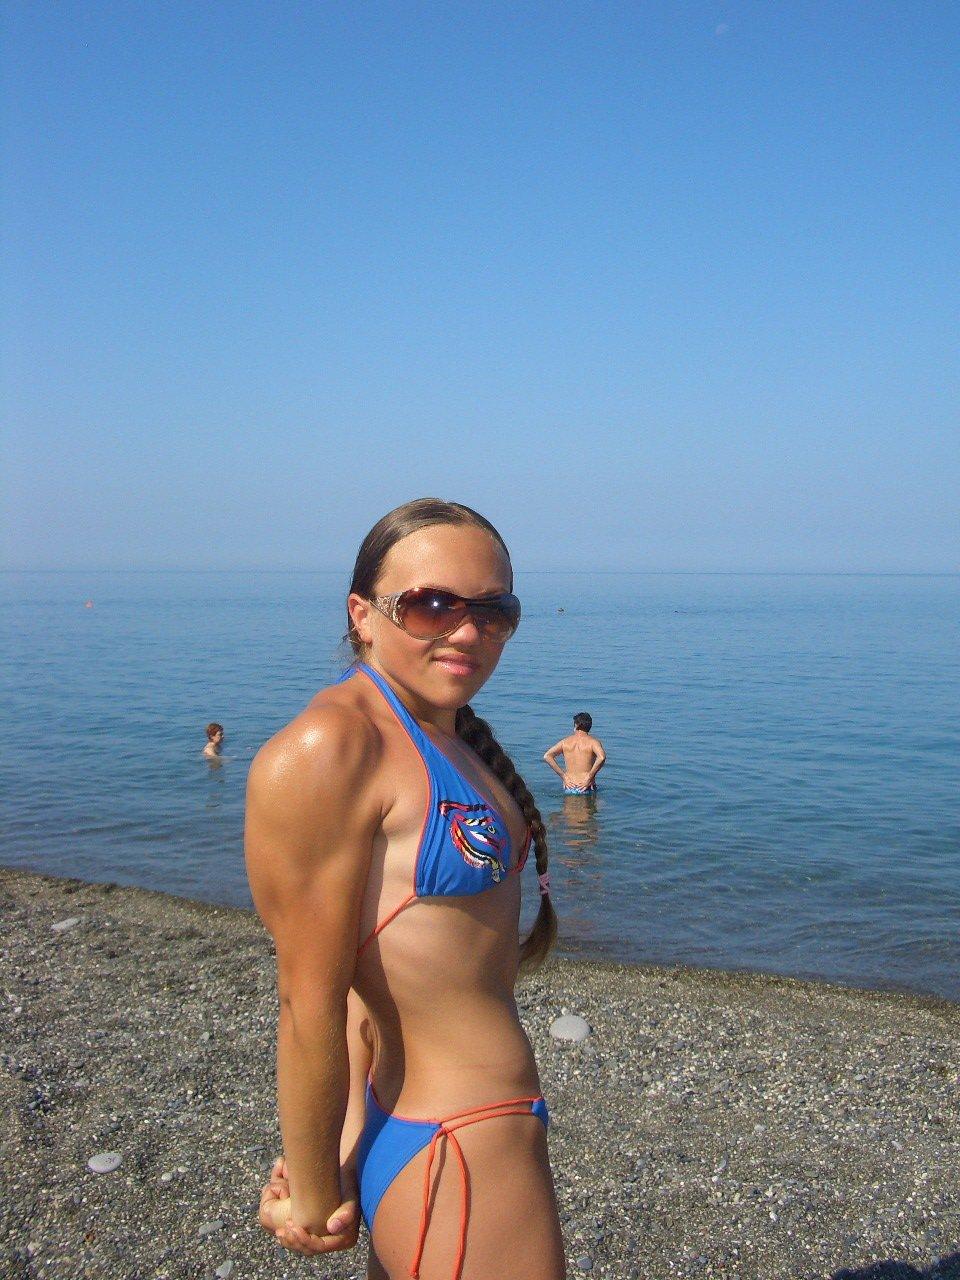 Natalia Trukhina Muscles